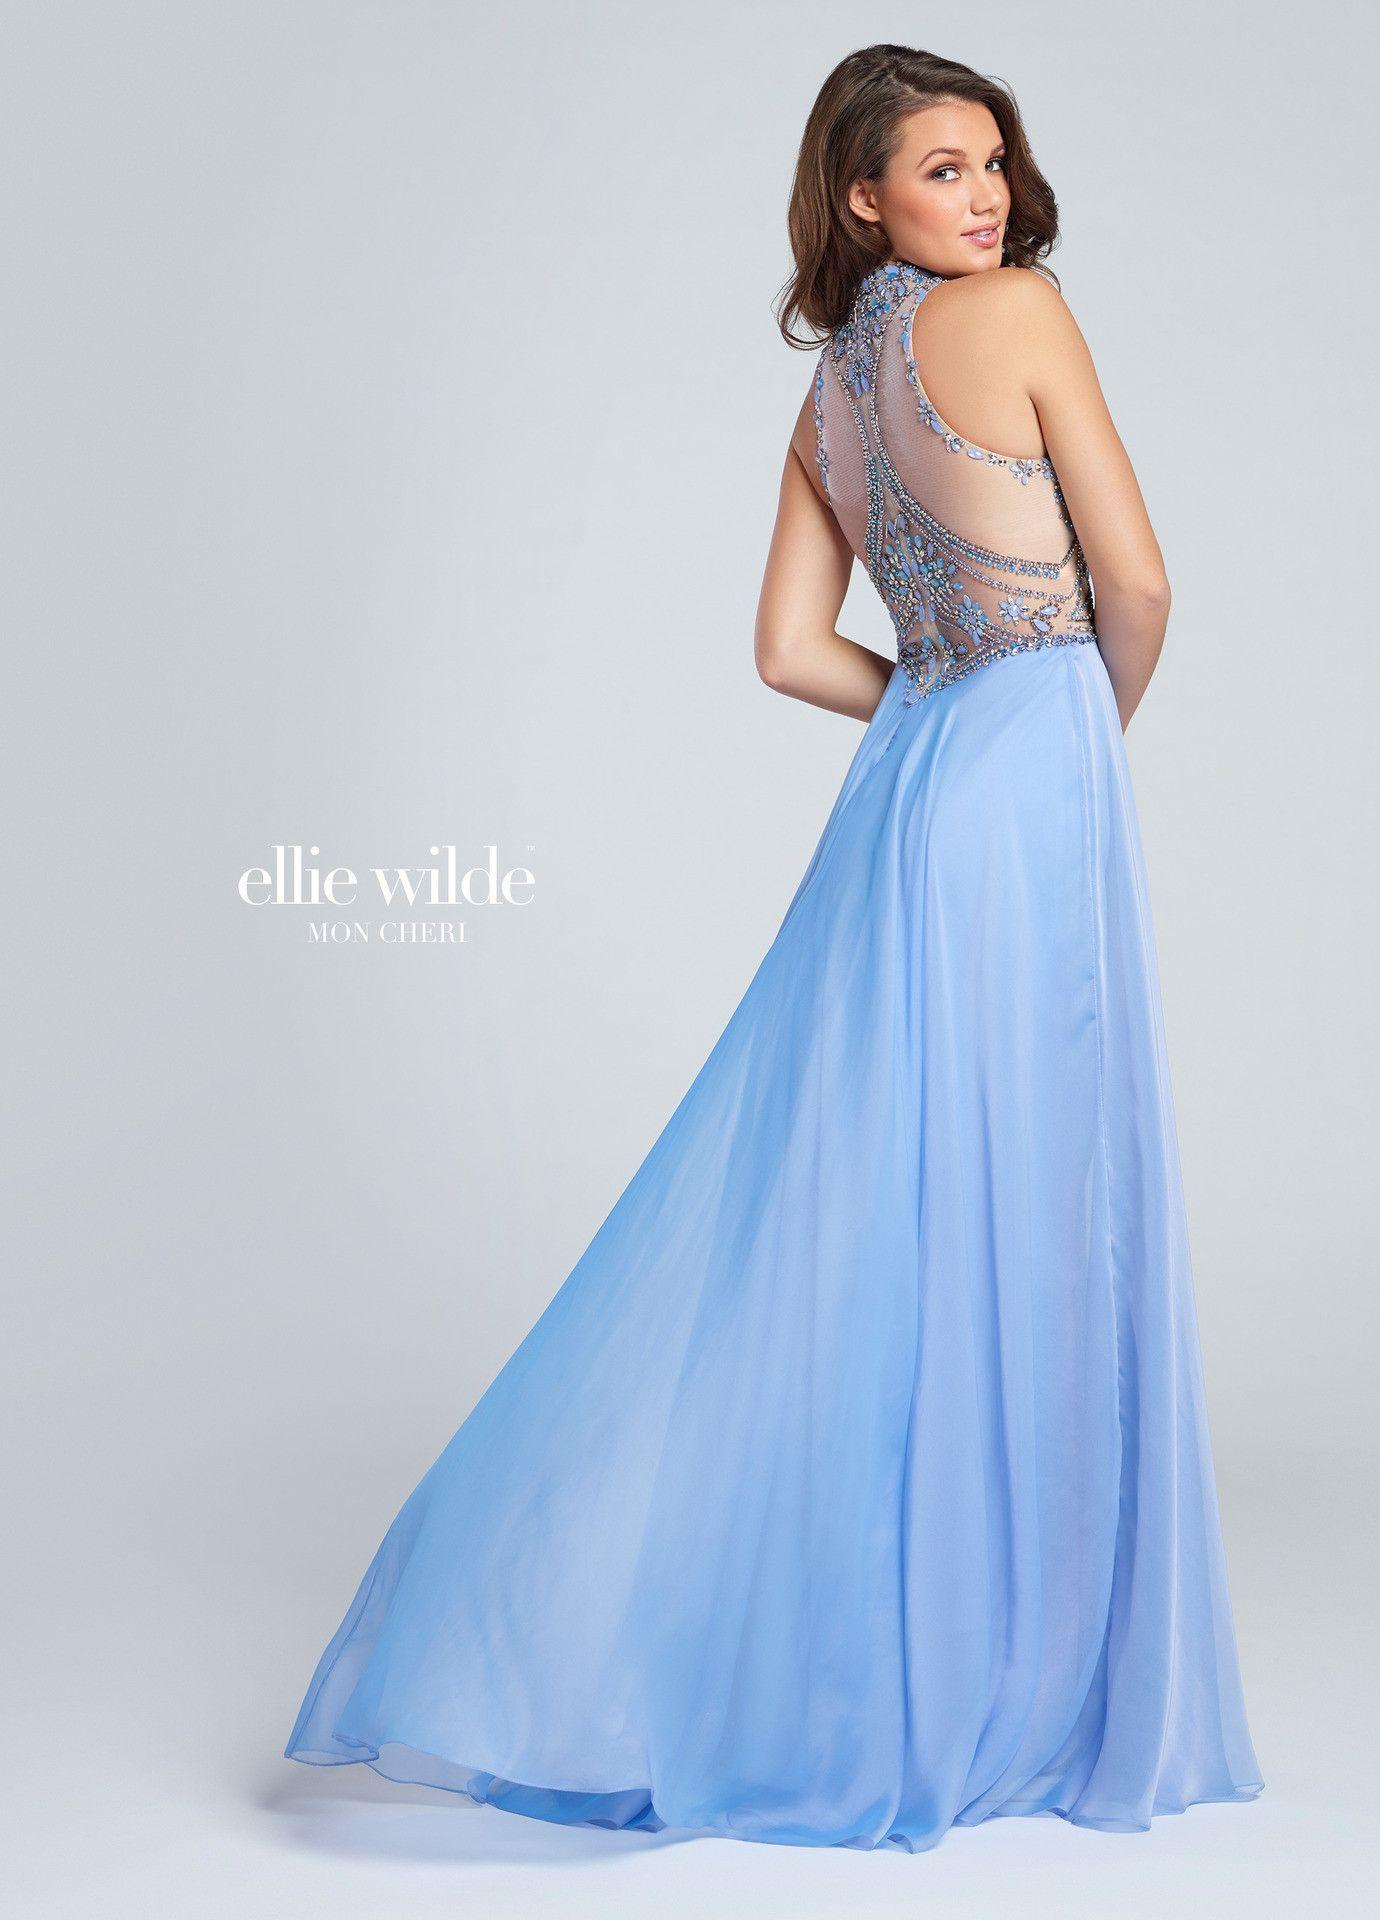 Ellie Wilde 117075 Periwinkle Beaded Illusion Back Chiffon Prom